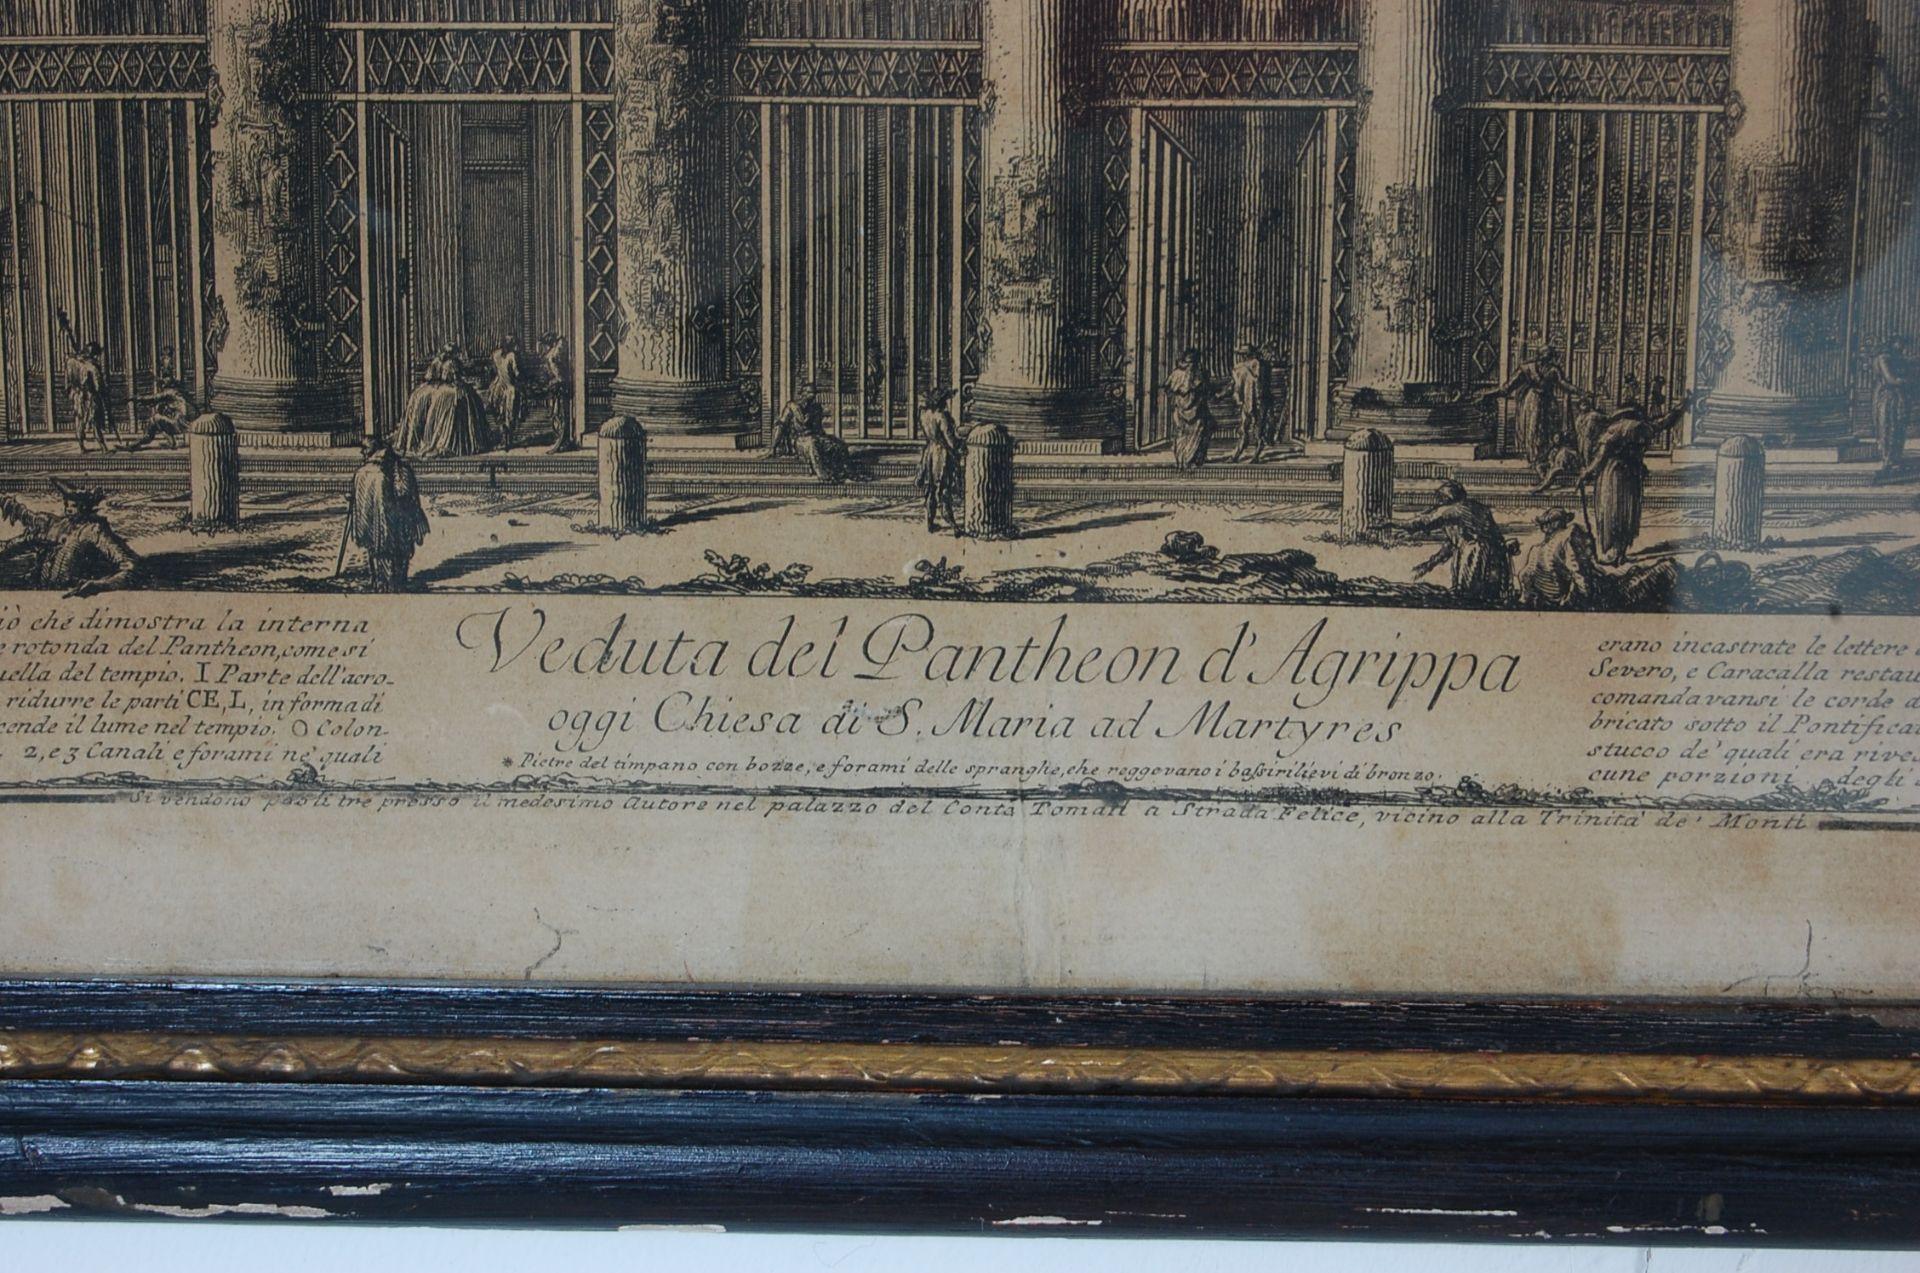 PANTHEON D'AGRIPPA AFTER GIOVANNI BATTISTA PIRANESI - Bild 6 aus 11